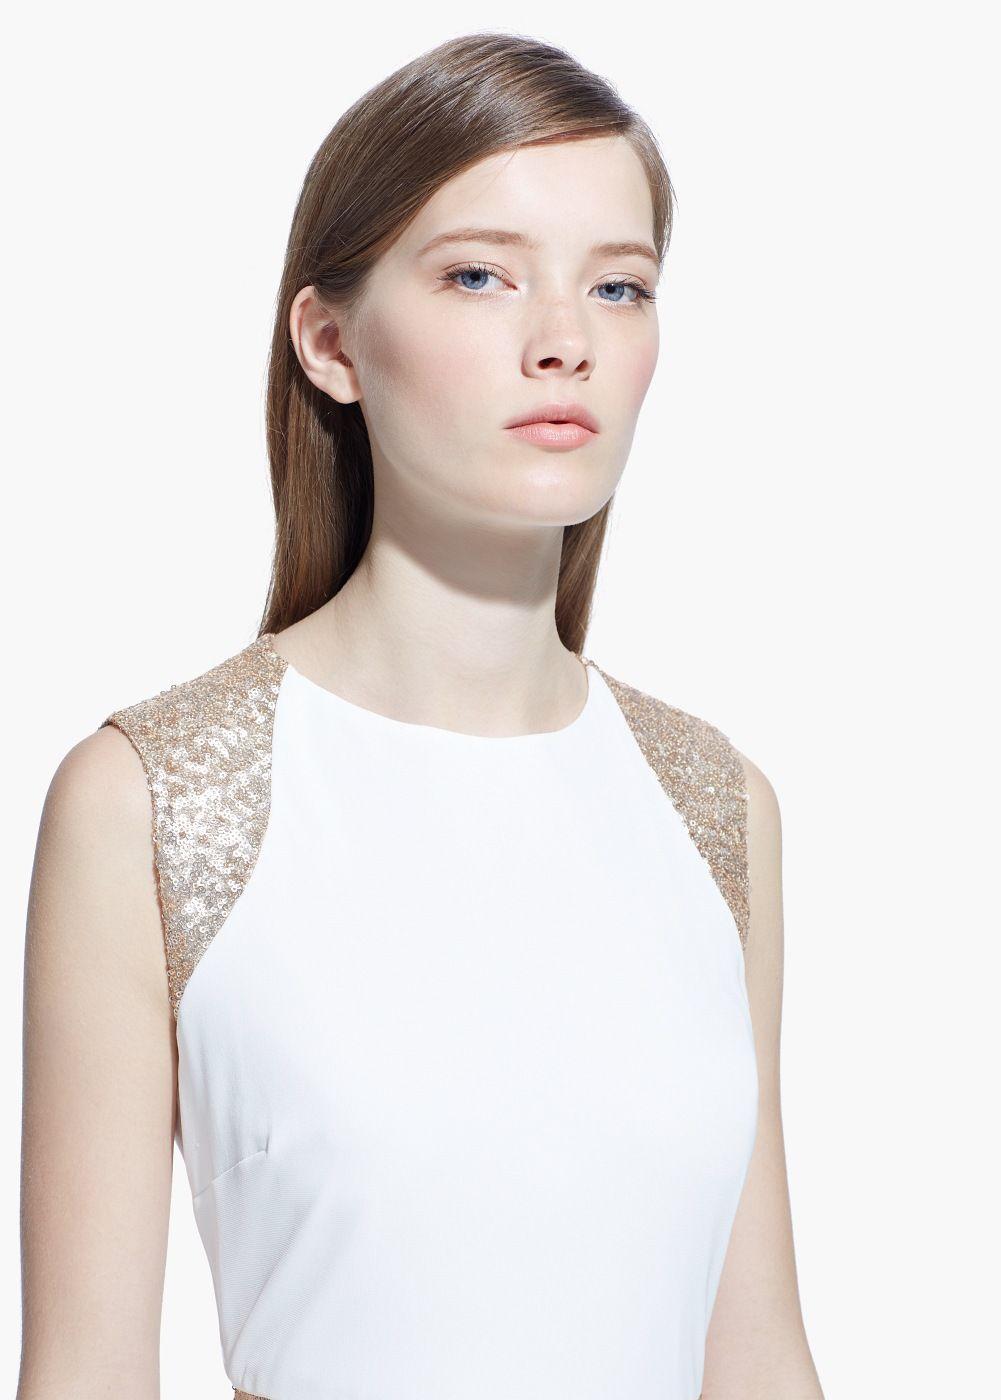 Vestido aplicações lantejoulas - Mulher   Pinterest   Fashion ... d99518f5d151